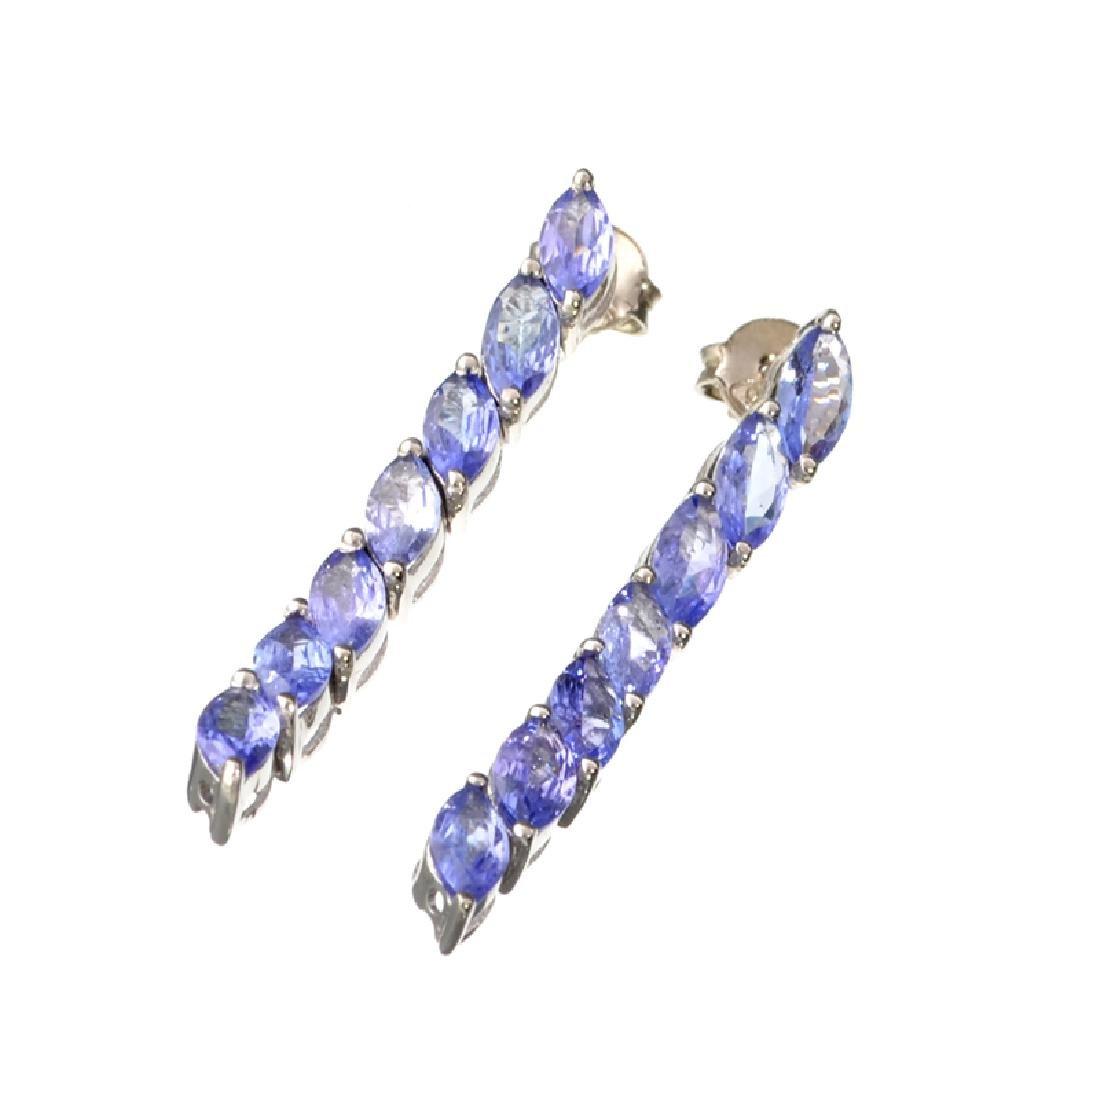 APP: 2.1k Fine Jewelry 3.20CT Marquise Cut Tanzanite